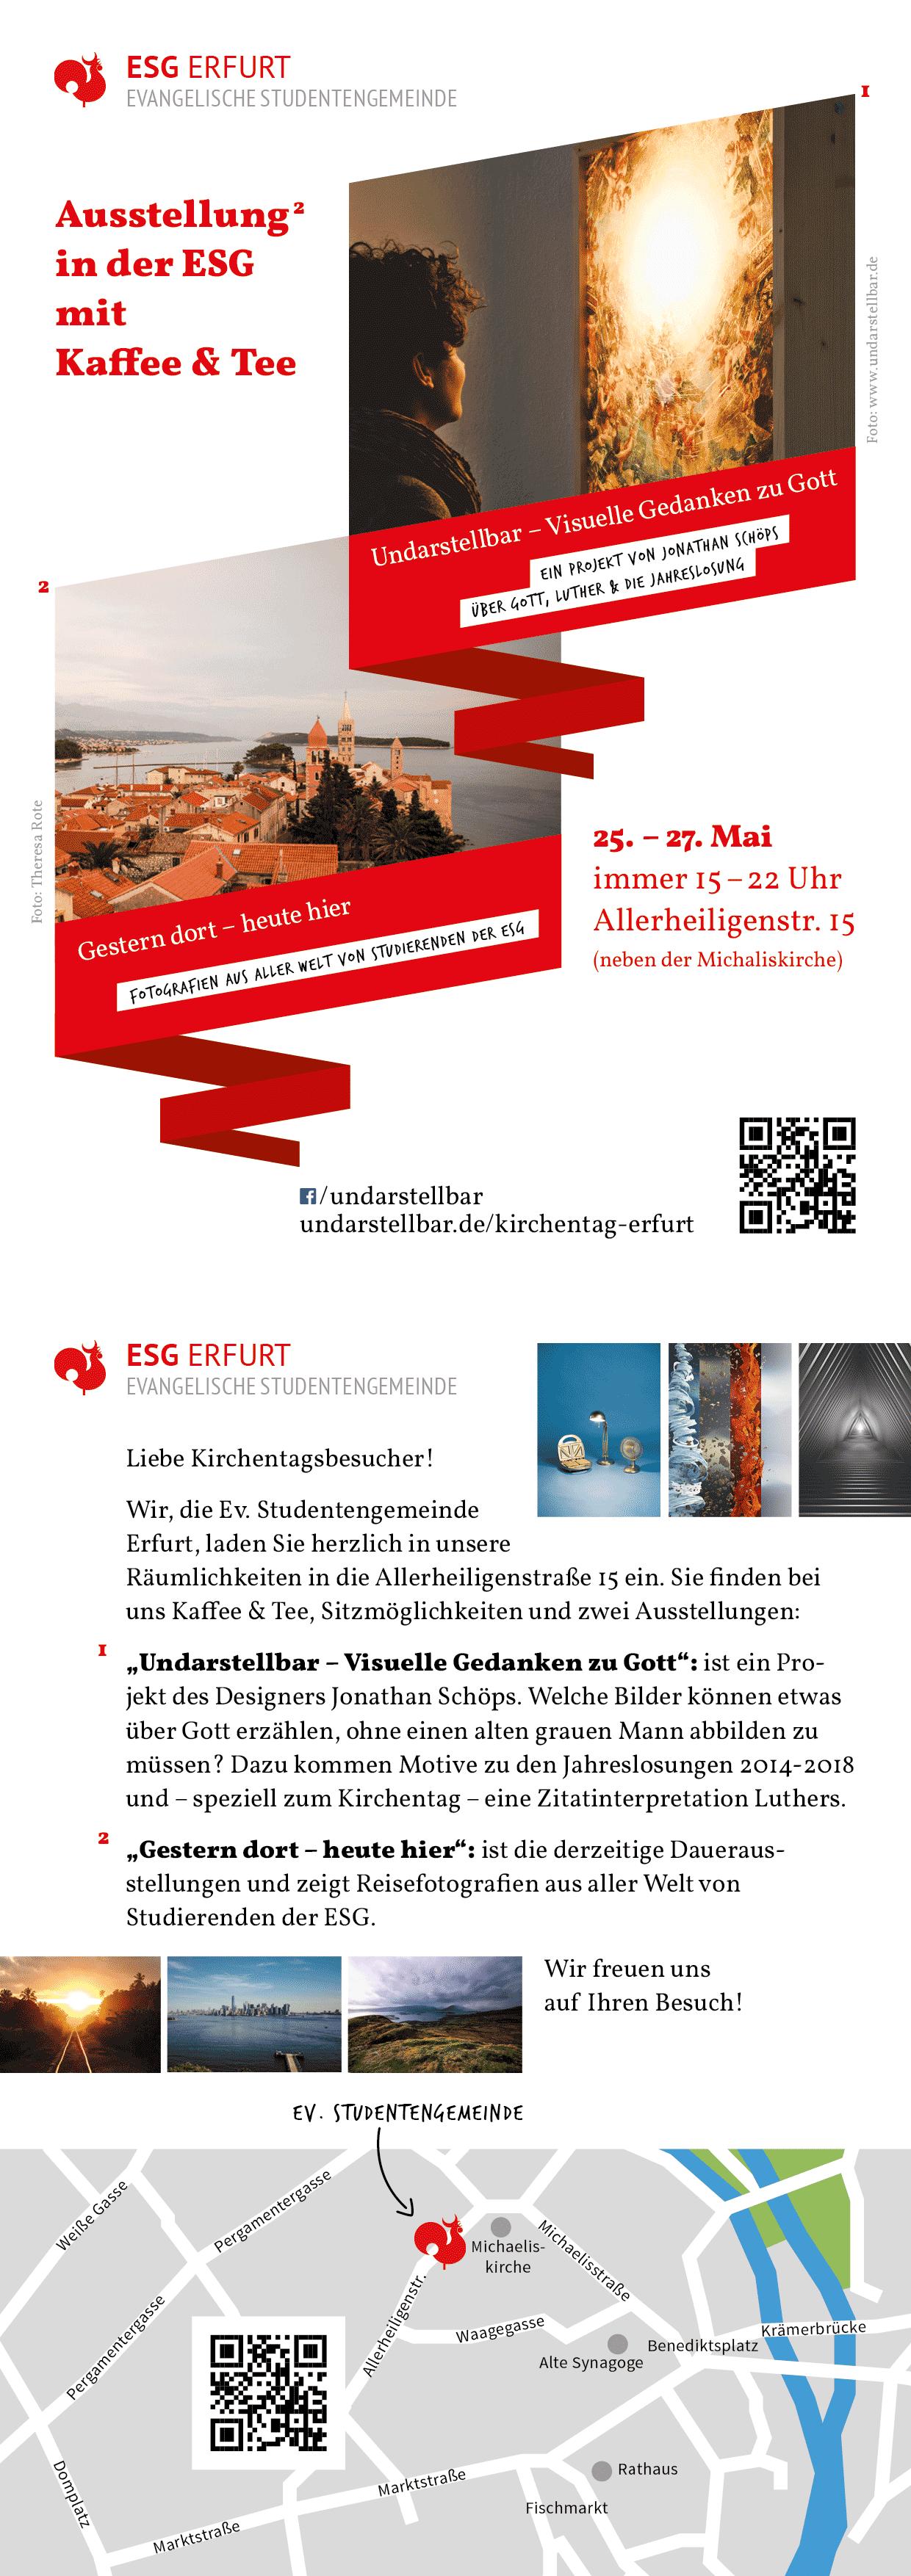 Kirchentag Ausstellung Undarstellbar ESG Erfurt Flyer